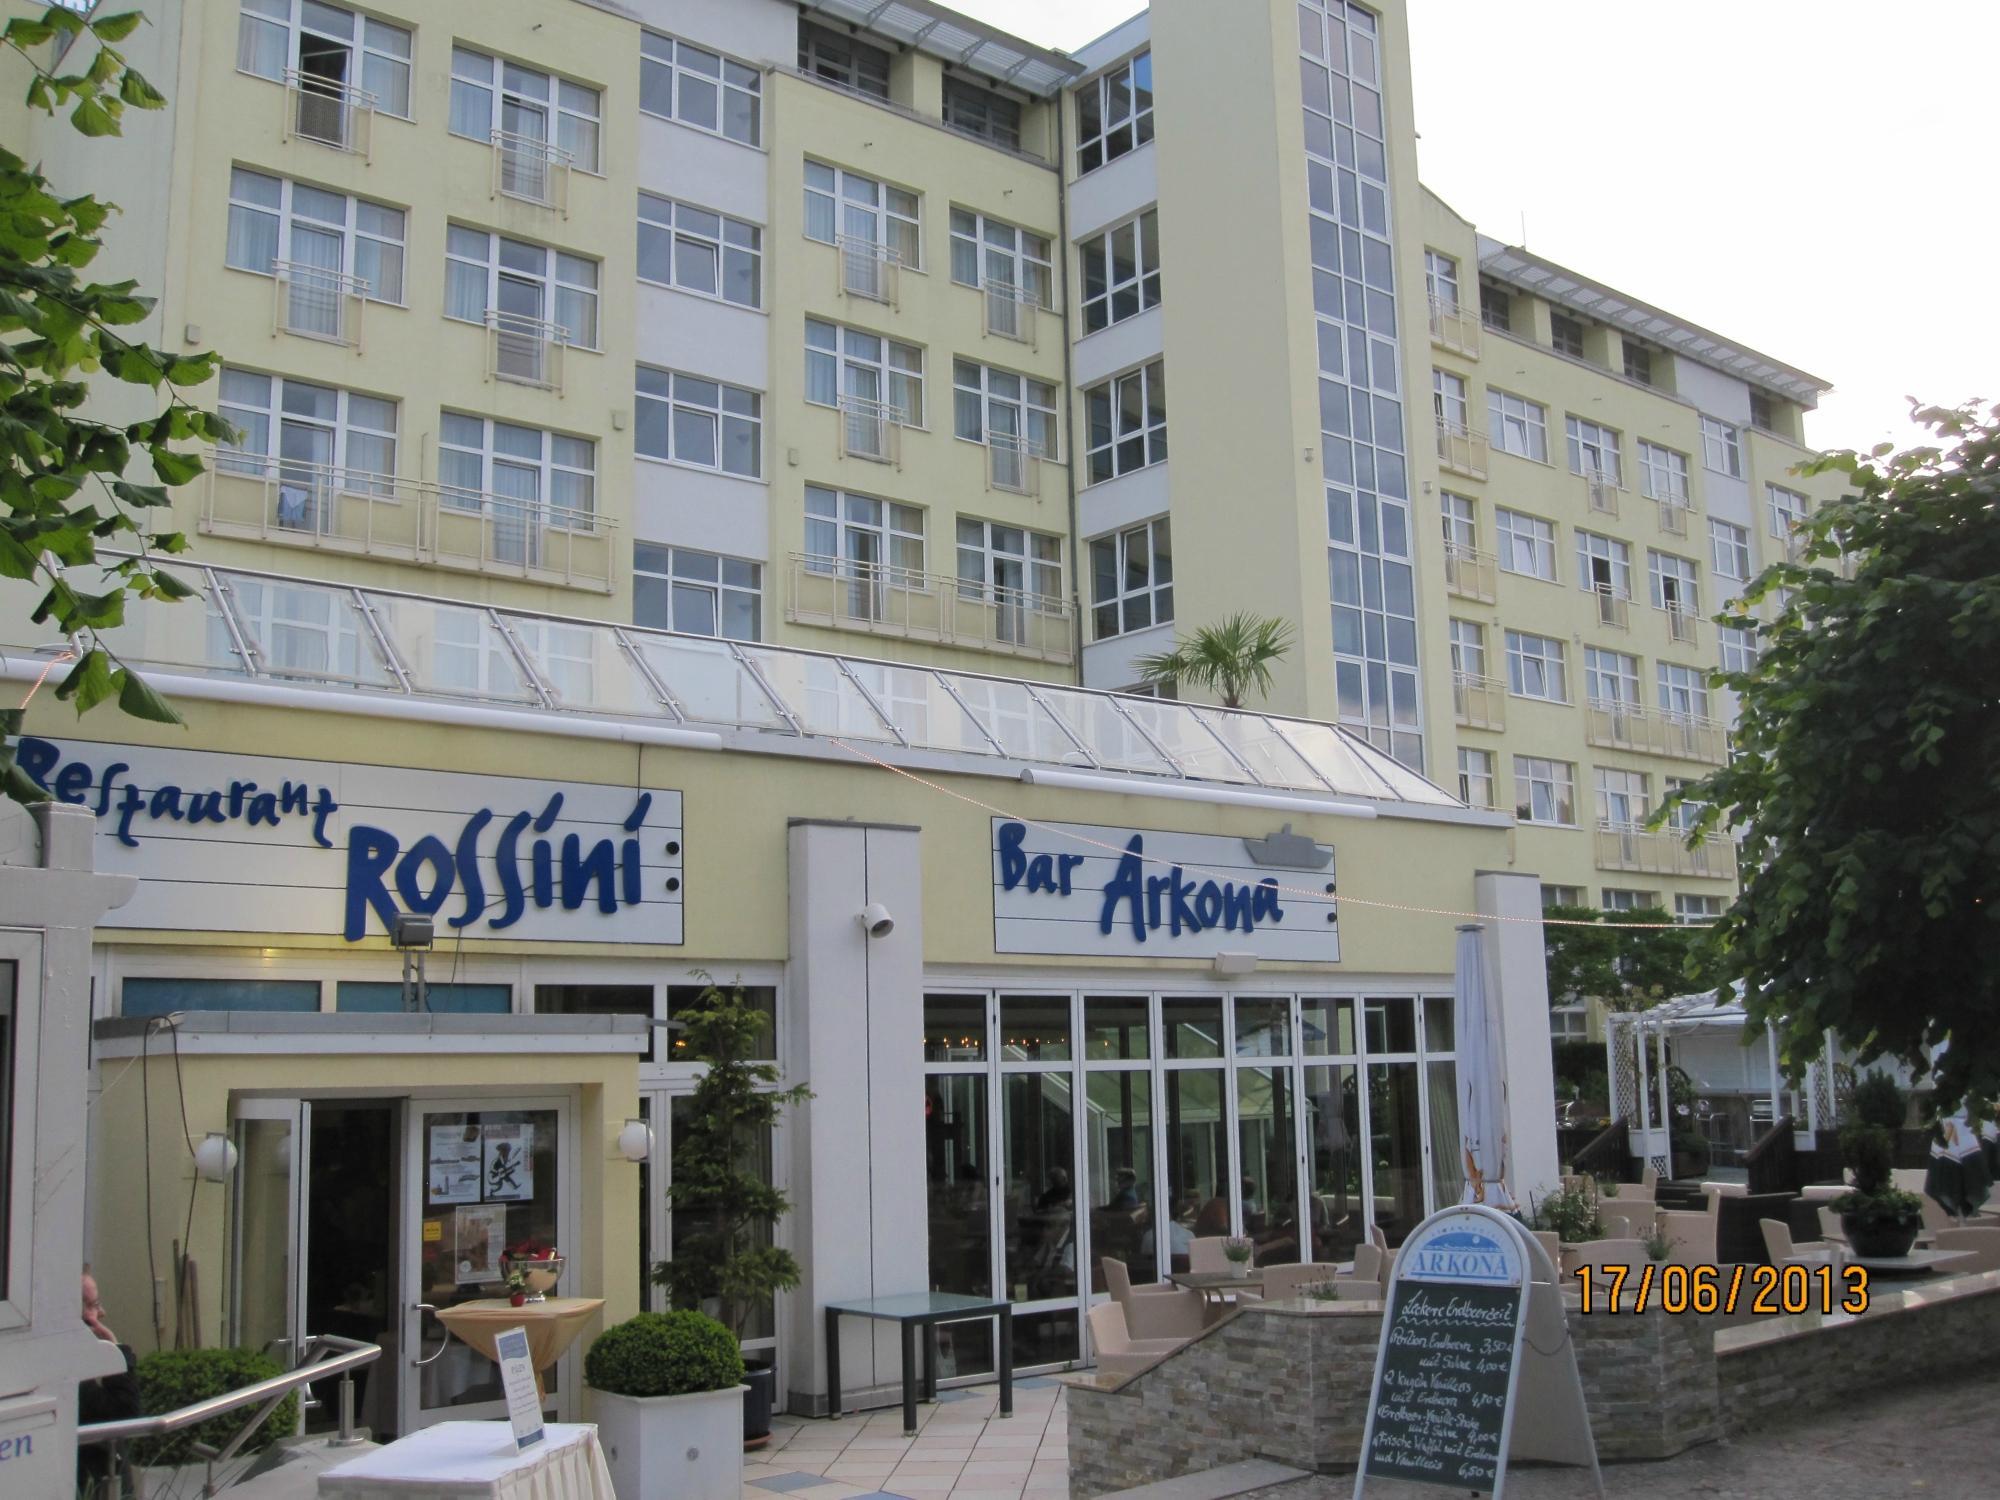 Arkona Strandhotel